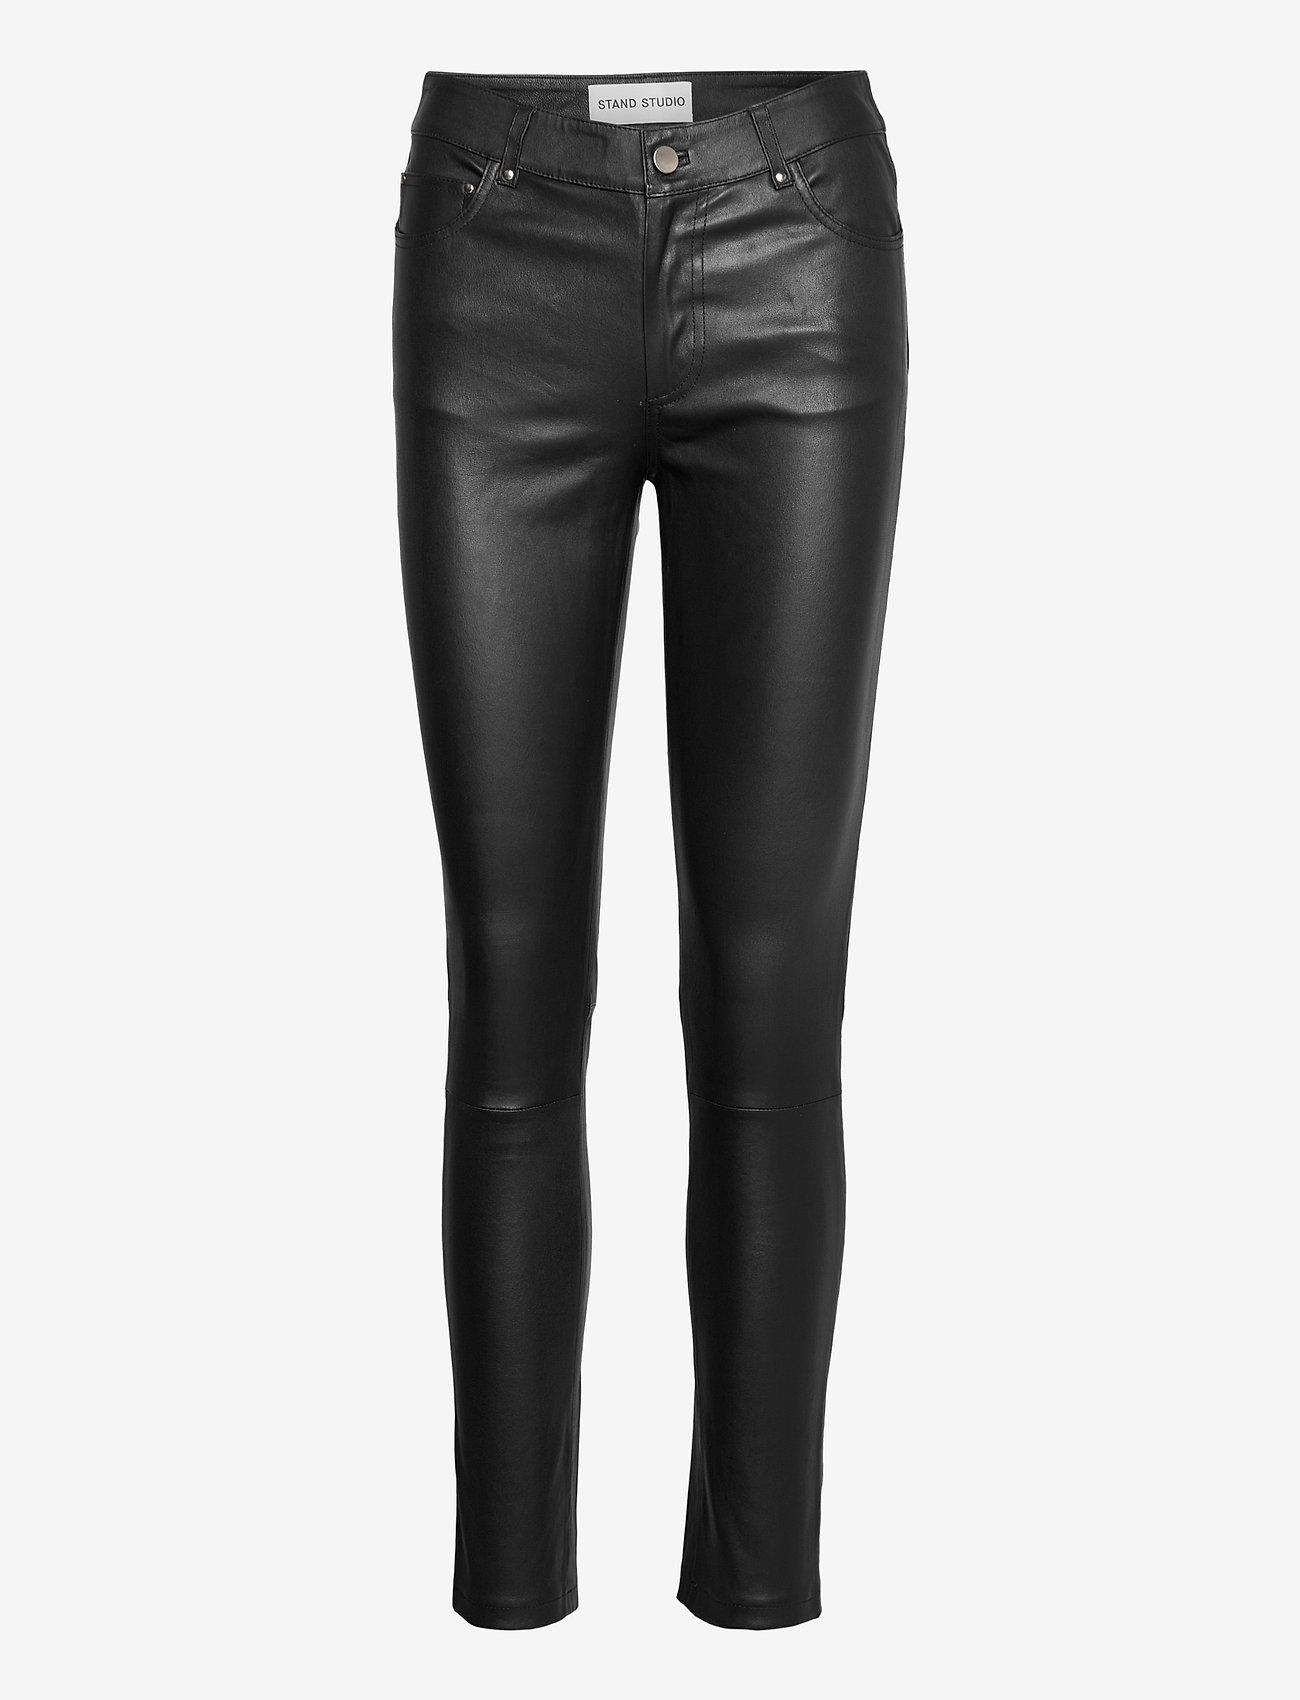 Stand Studio - Stella Jeans II - læderbukser - black - 0